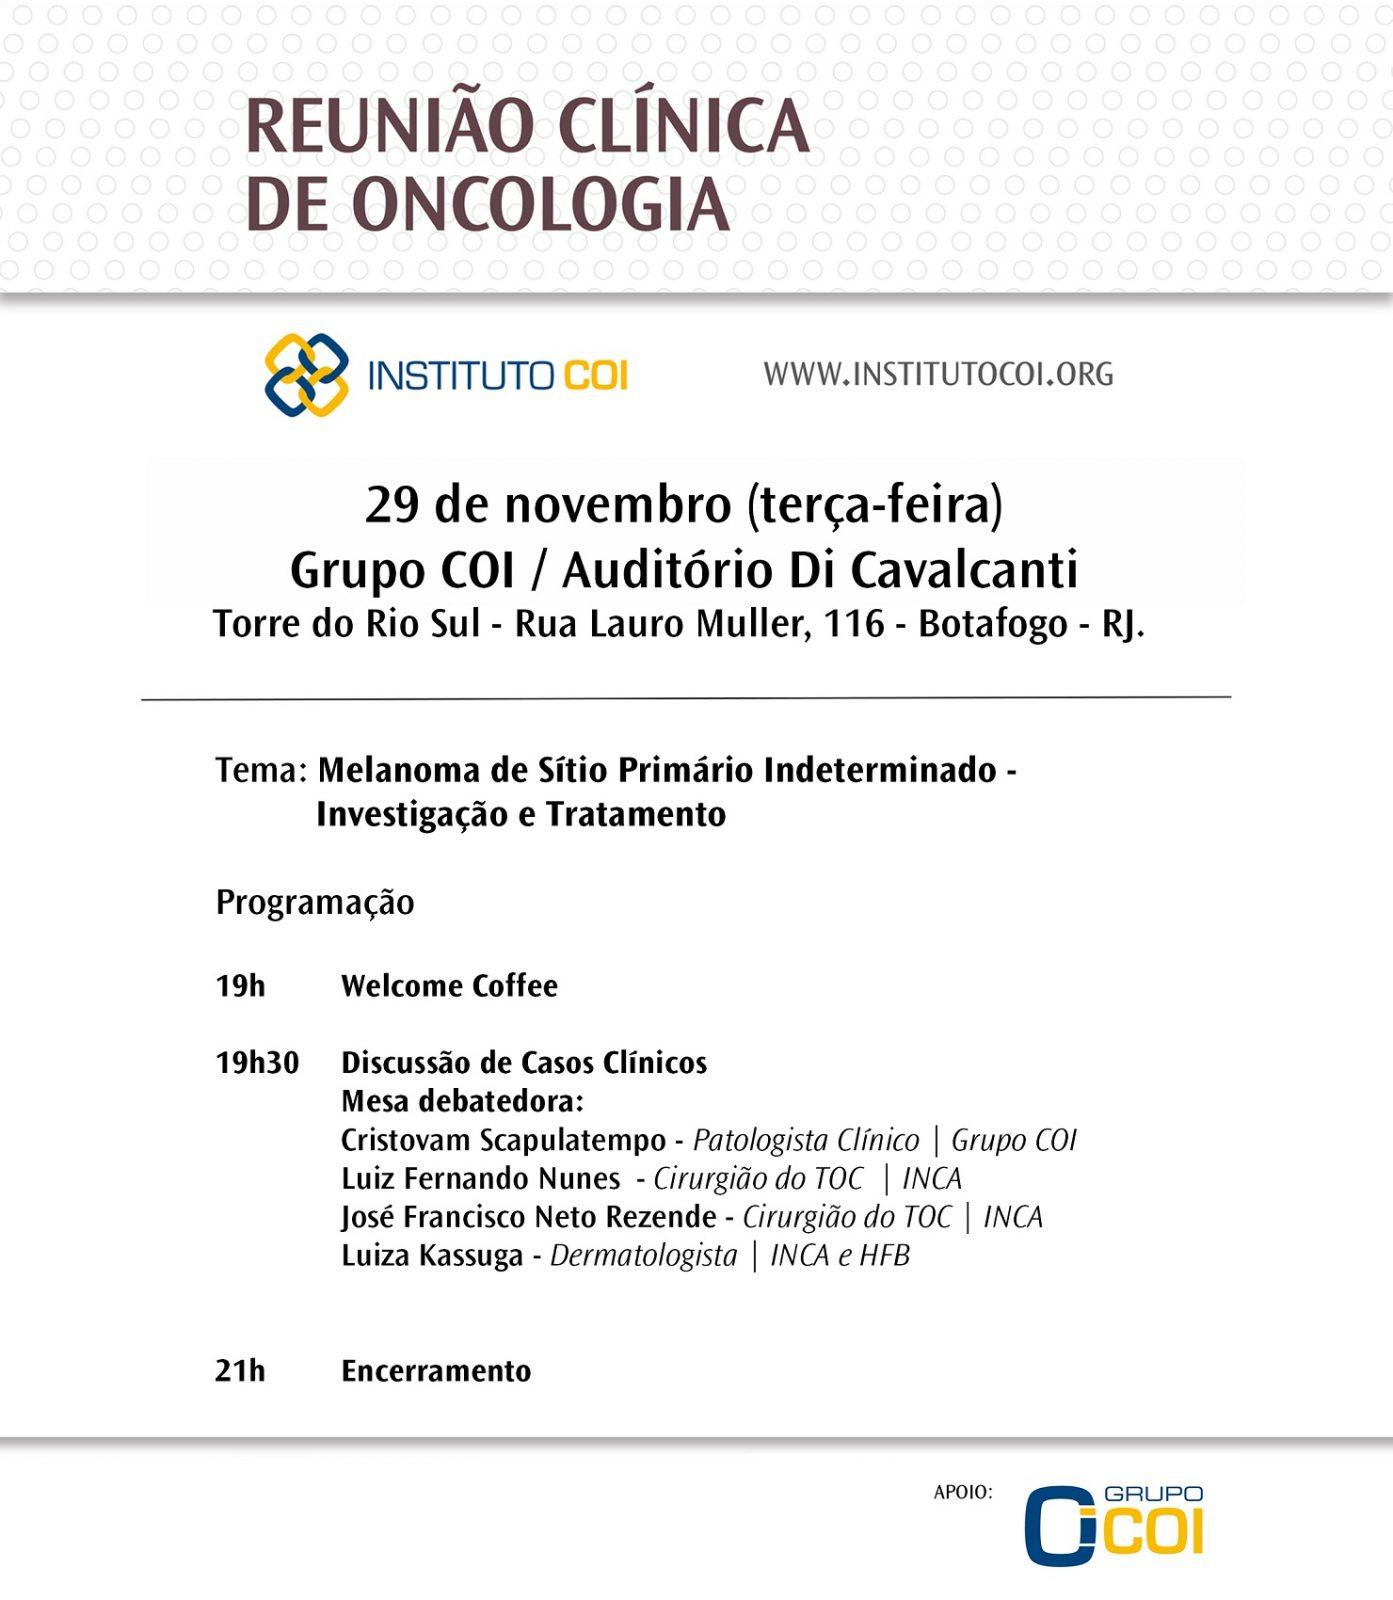 reuniaoclinica-de-oncologia-29-11